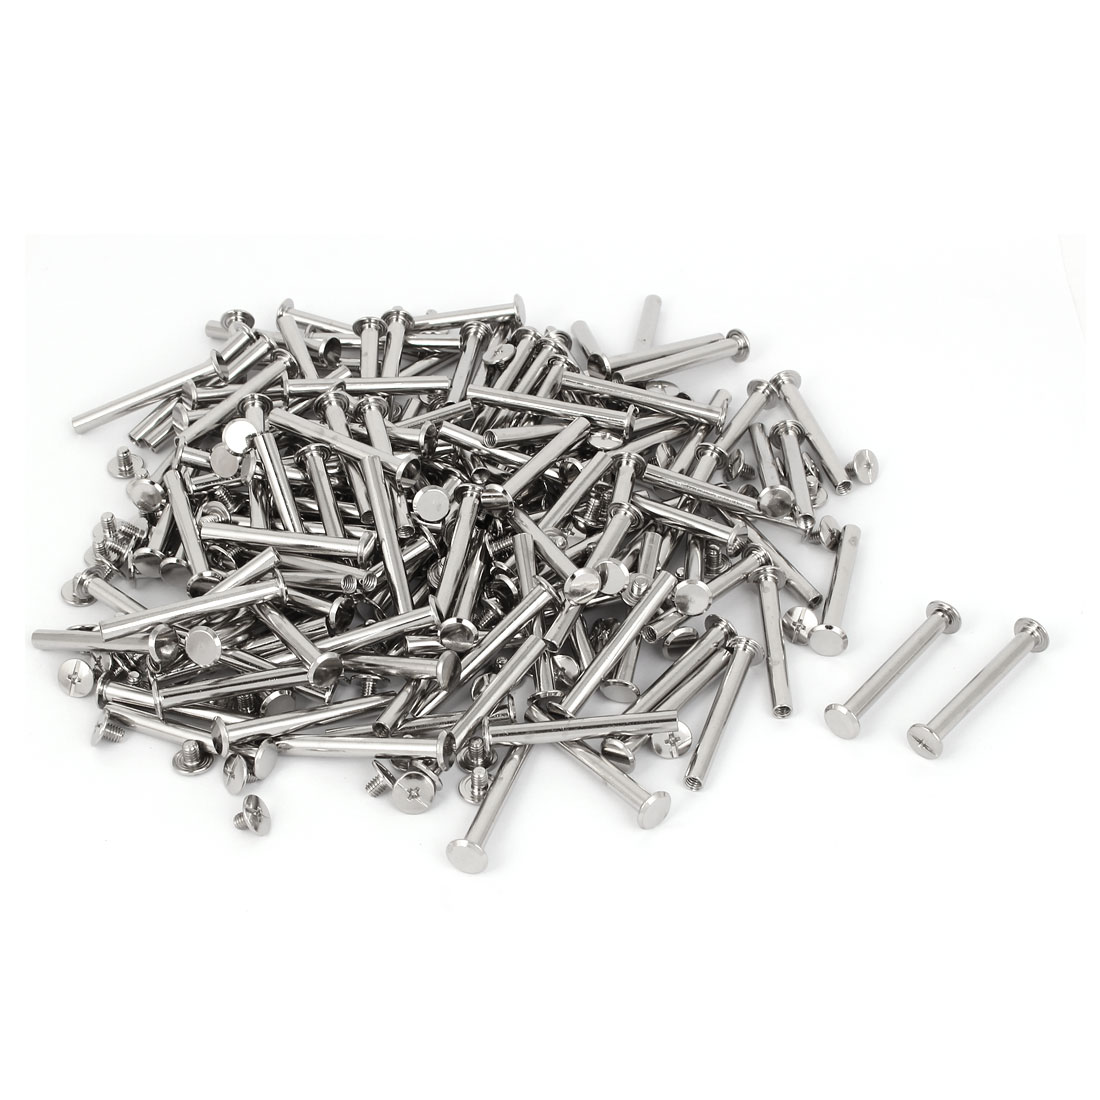 M5 x 42mm Photo Albums Aluminum Binding Screw Post Silver Tone 200 Pcs